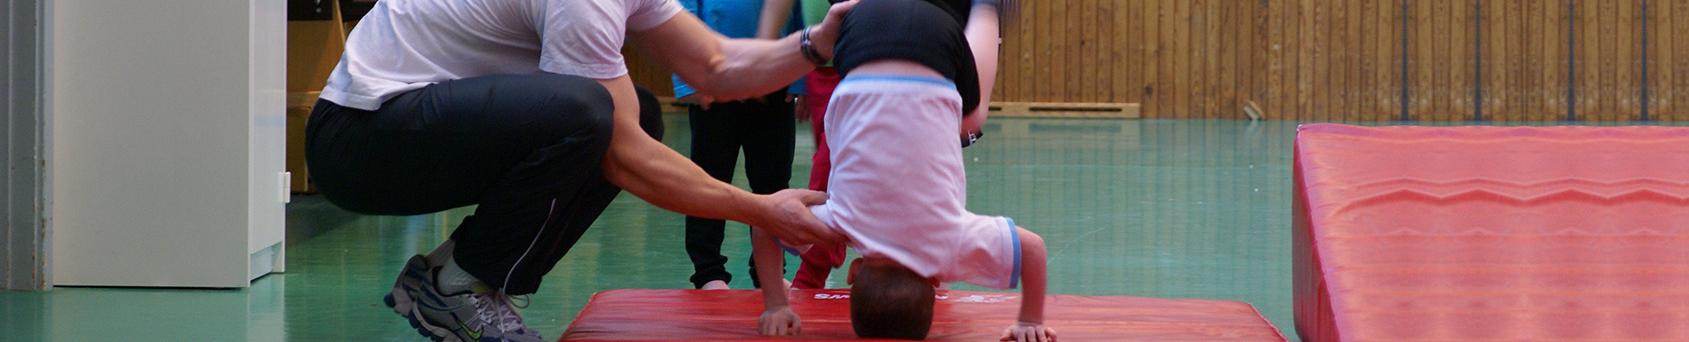 Akrobatiklekis barn gymnastik Stockholm